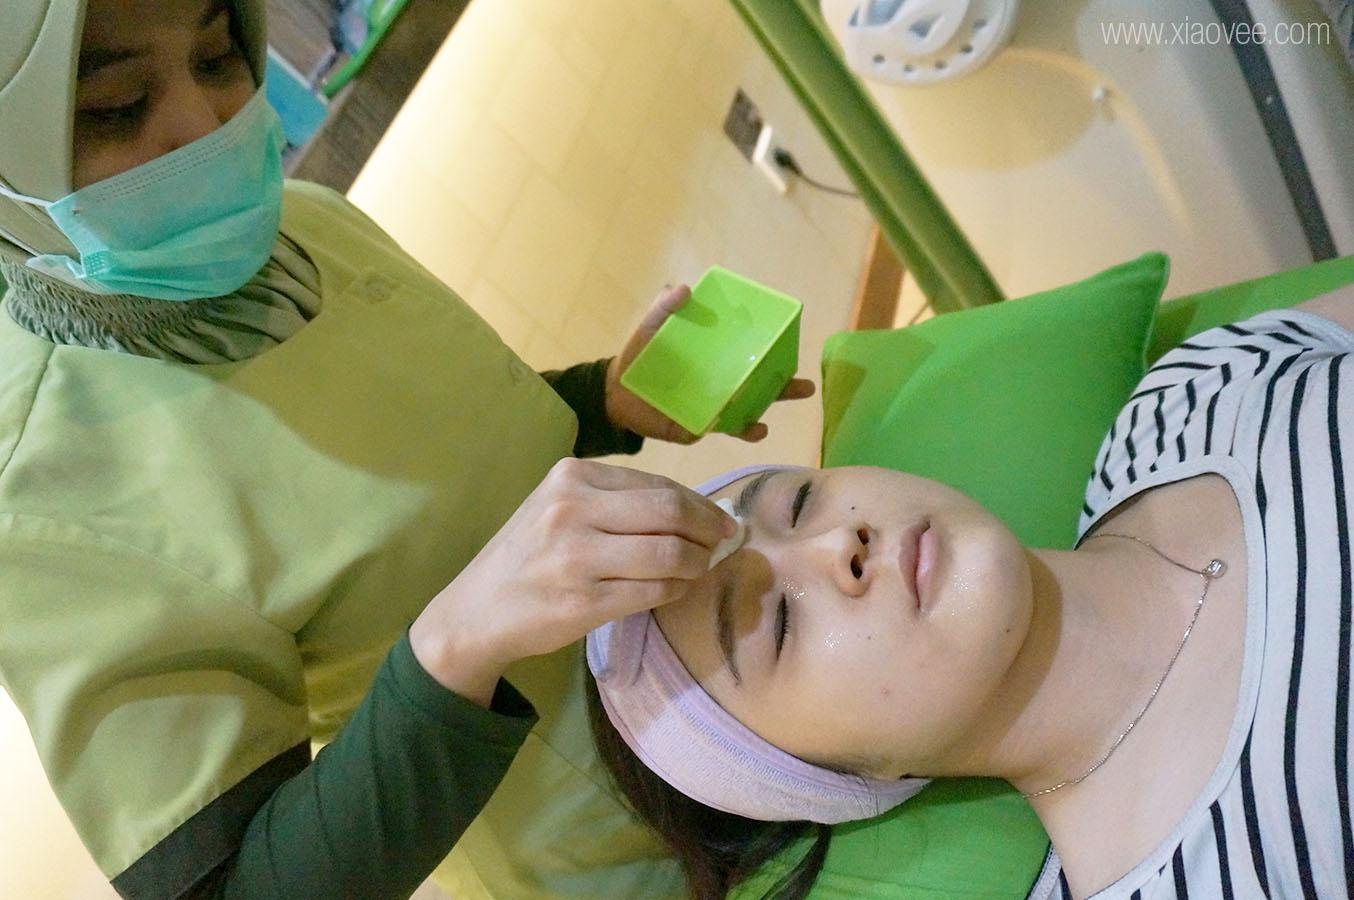 ZAP permanent hair removal, ZAP clinic, ZAP Facial rejuvenation, ZAP Surabaya,